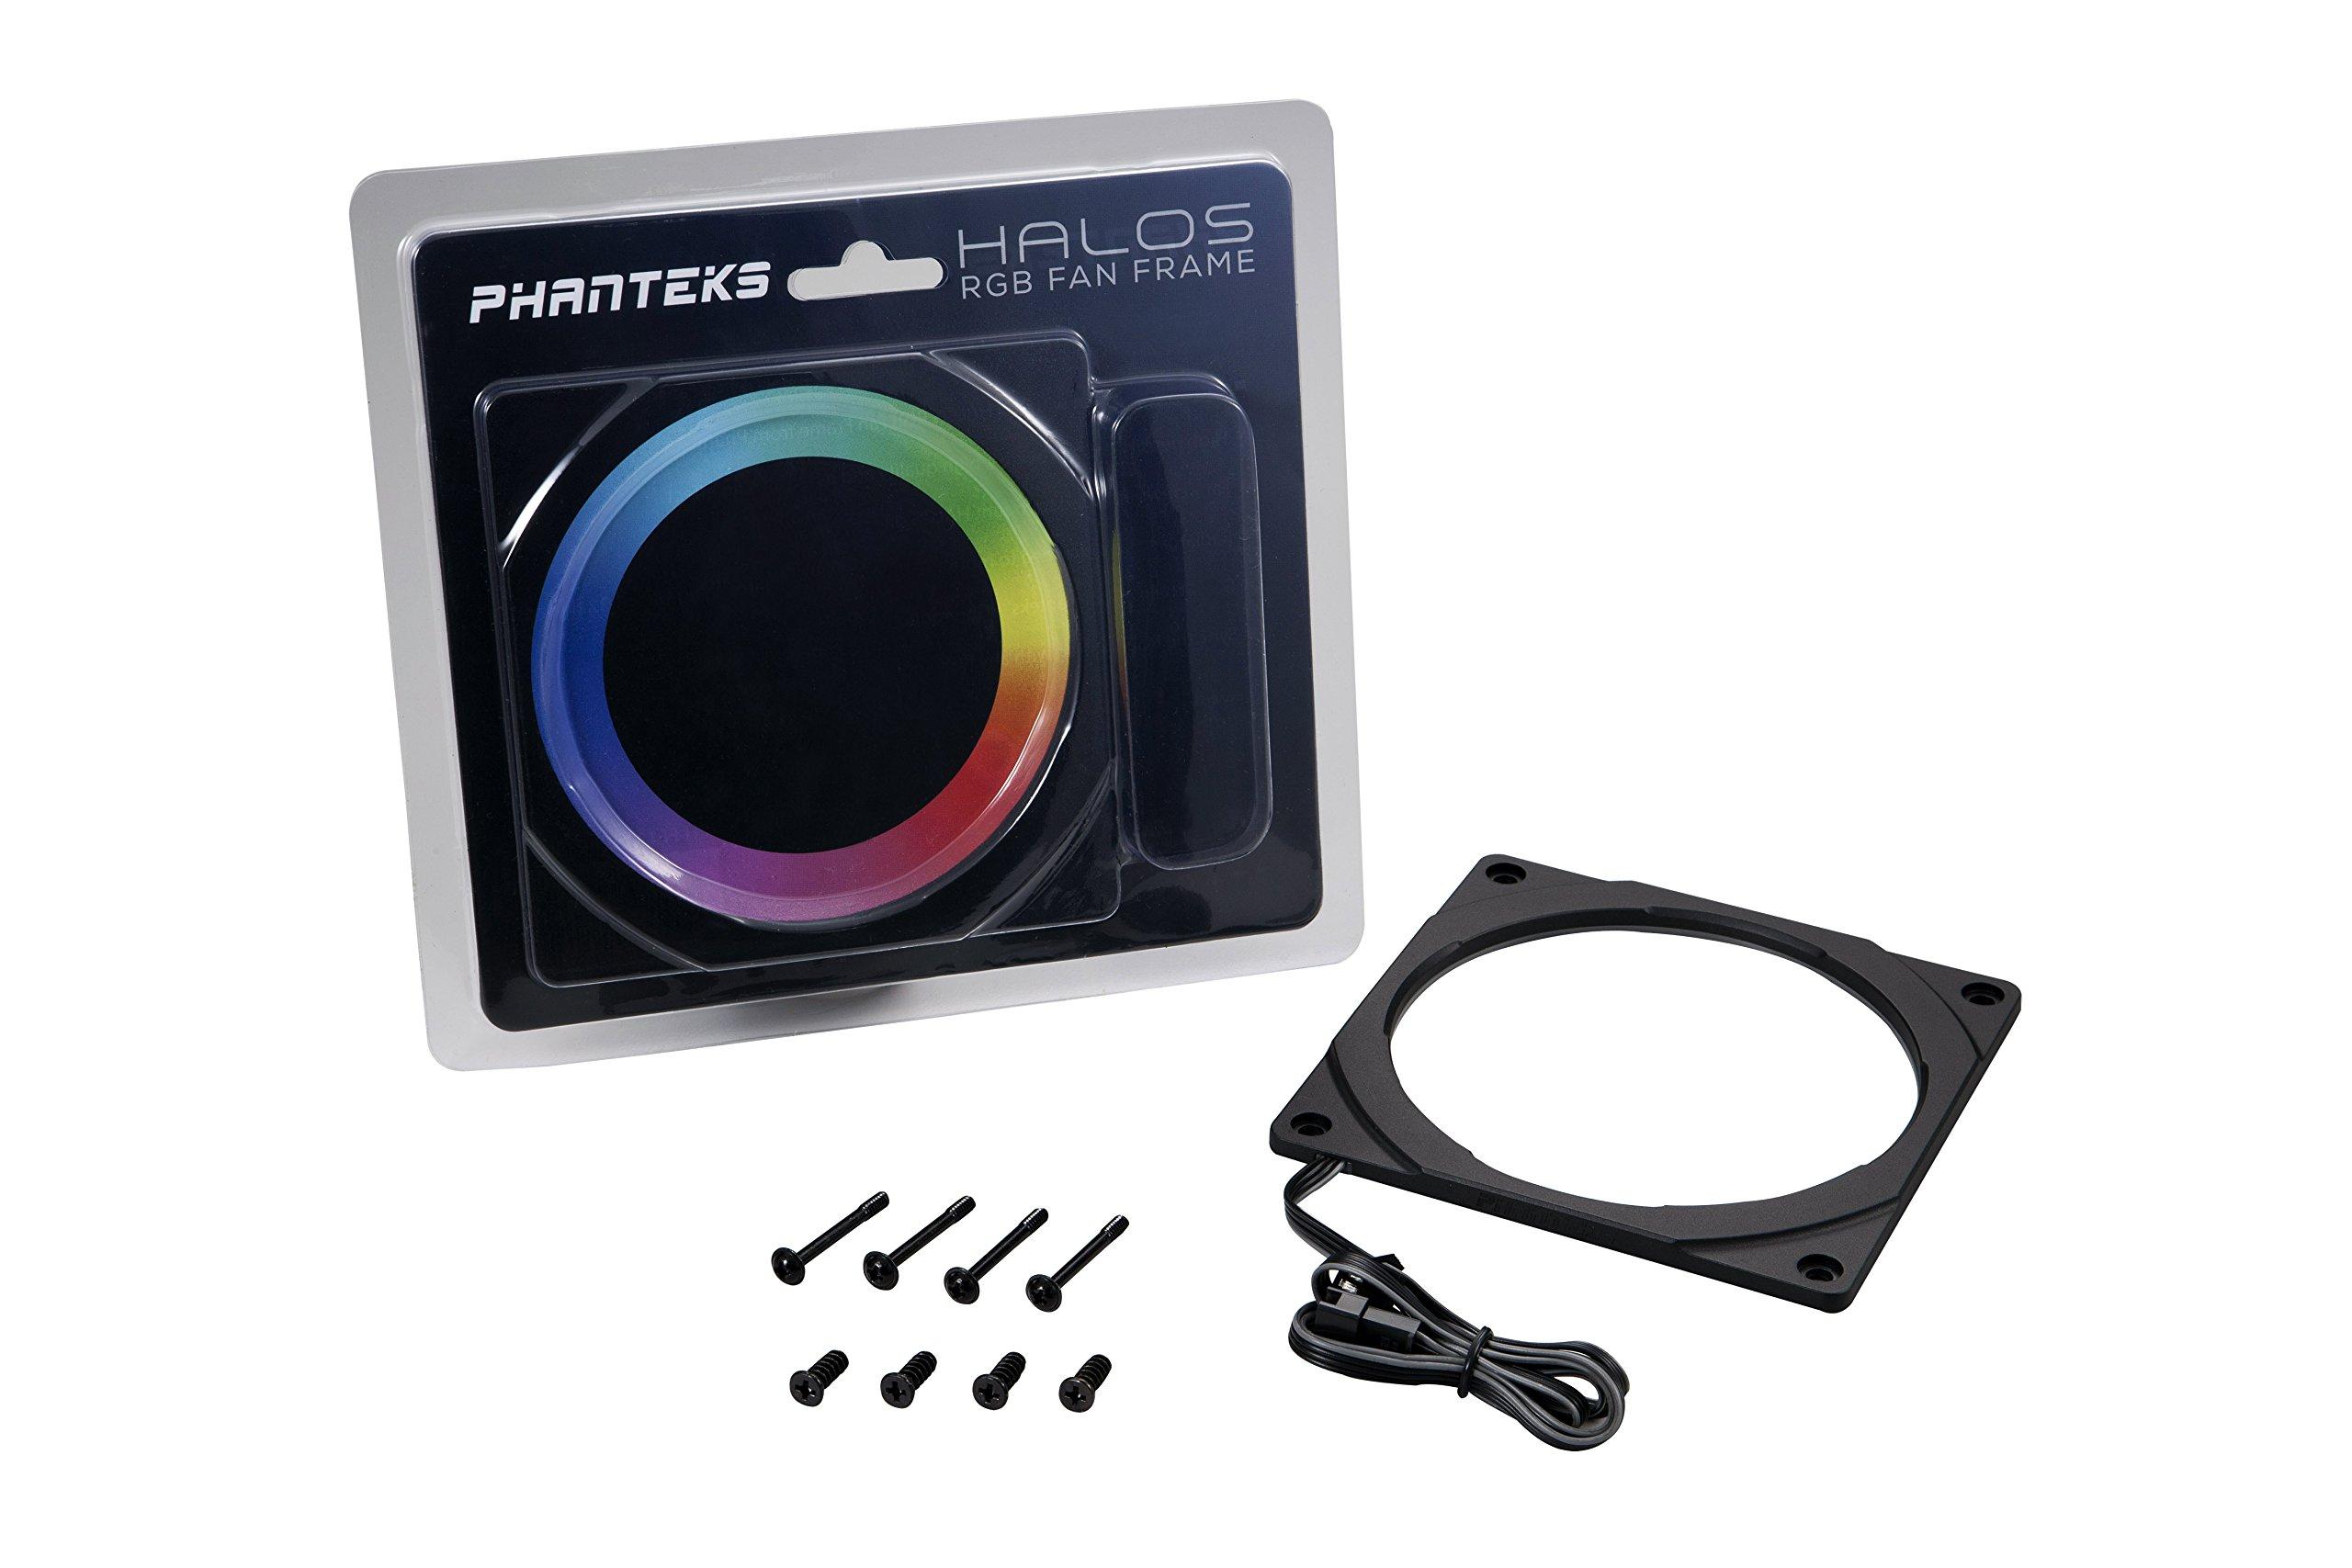 Phanteks PH-FF120RGBP_BK01 Halos RGB Fan Frame High density LEDs RGB 120mm fan mounting by Phanteks (Image #1)